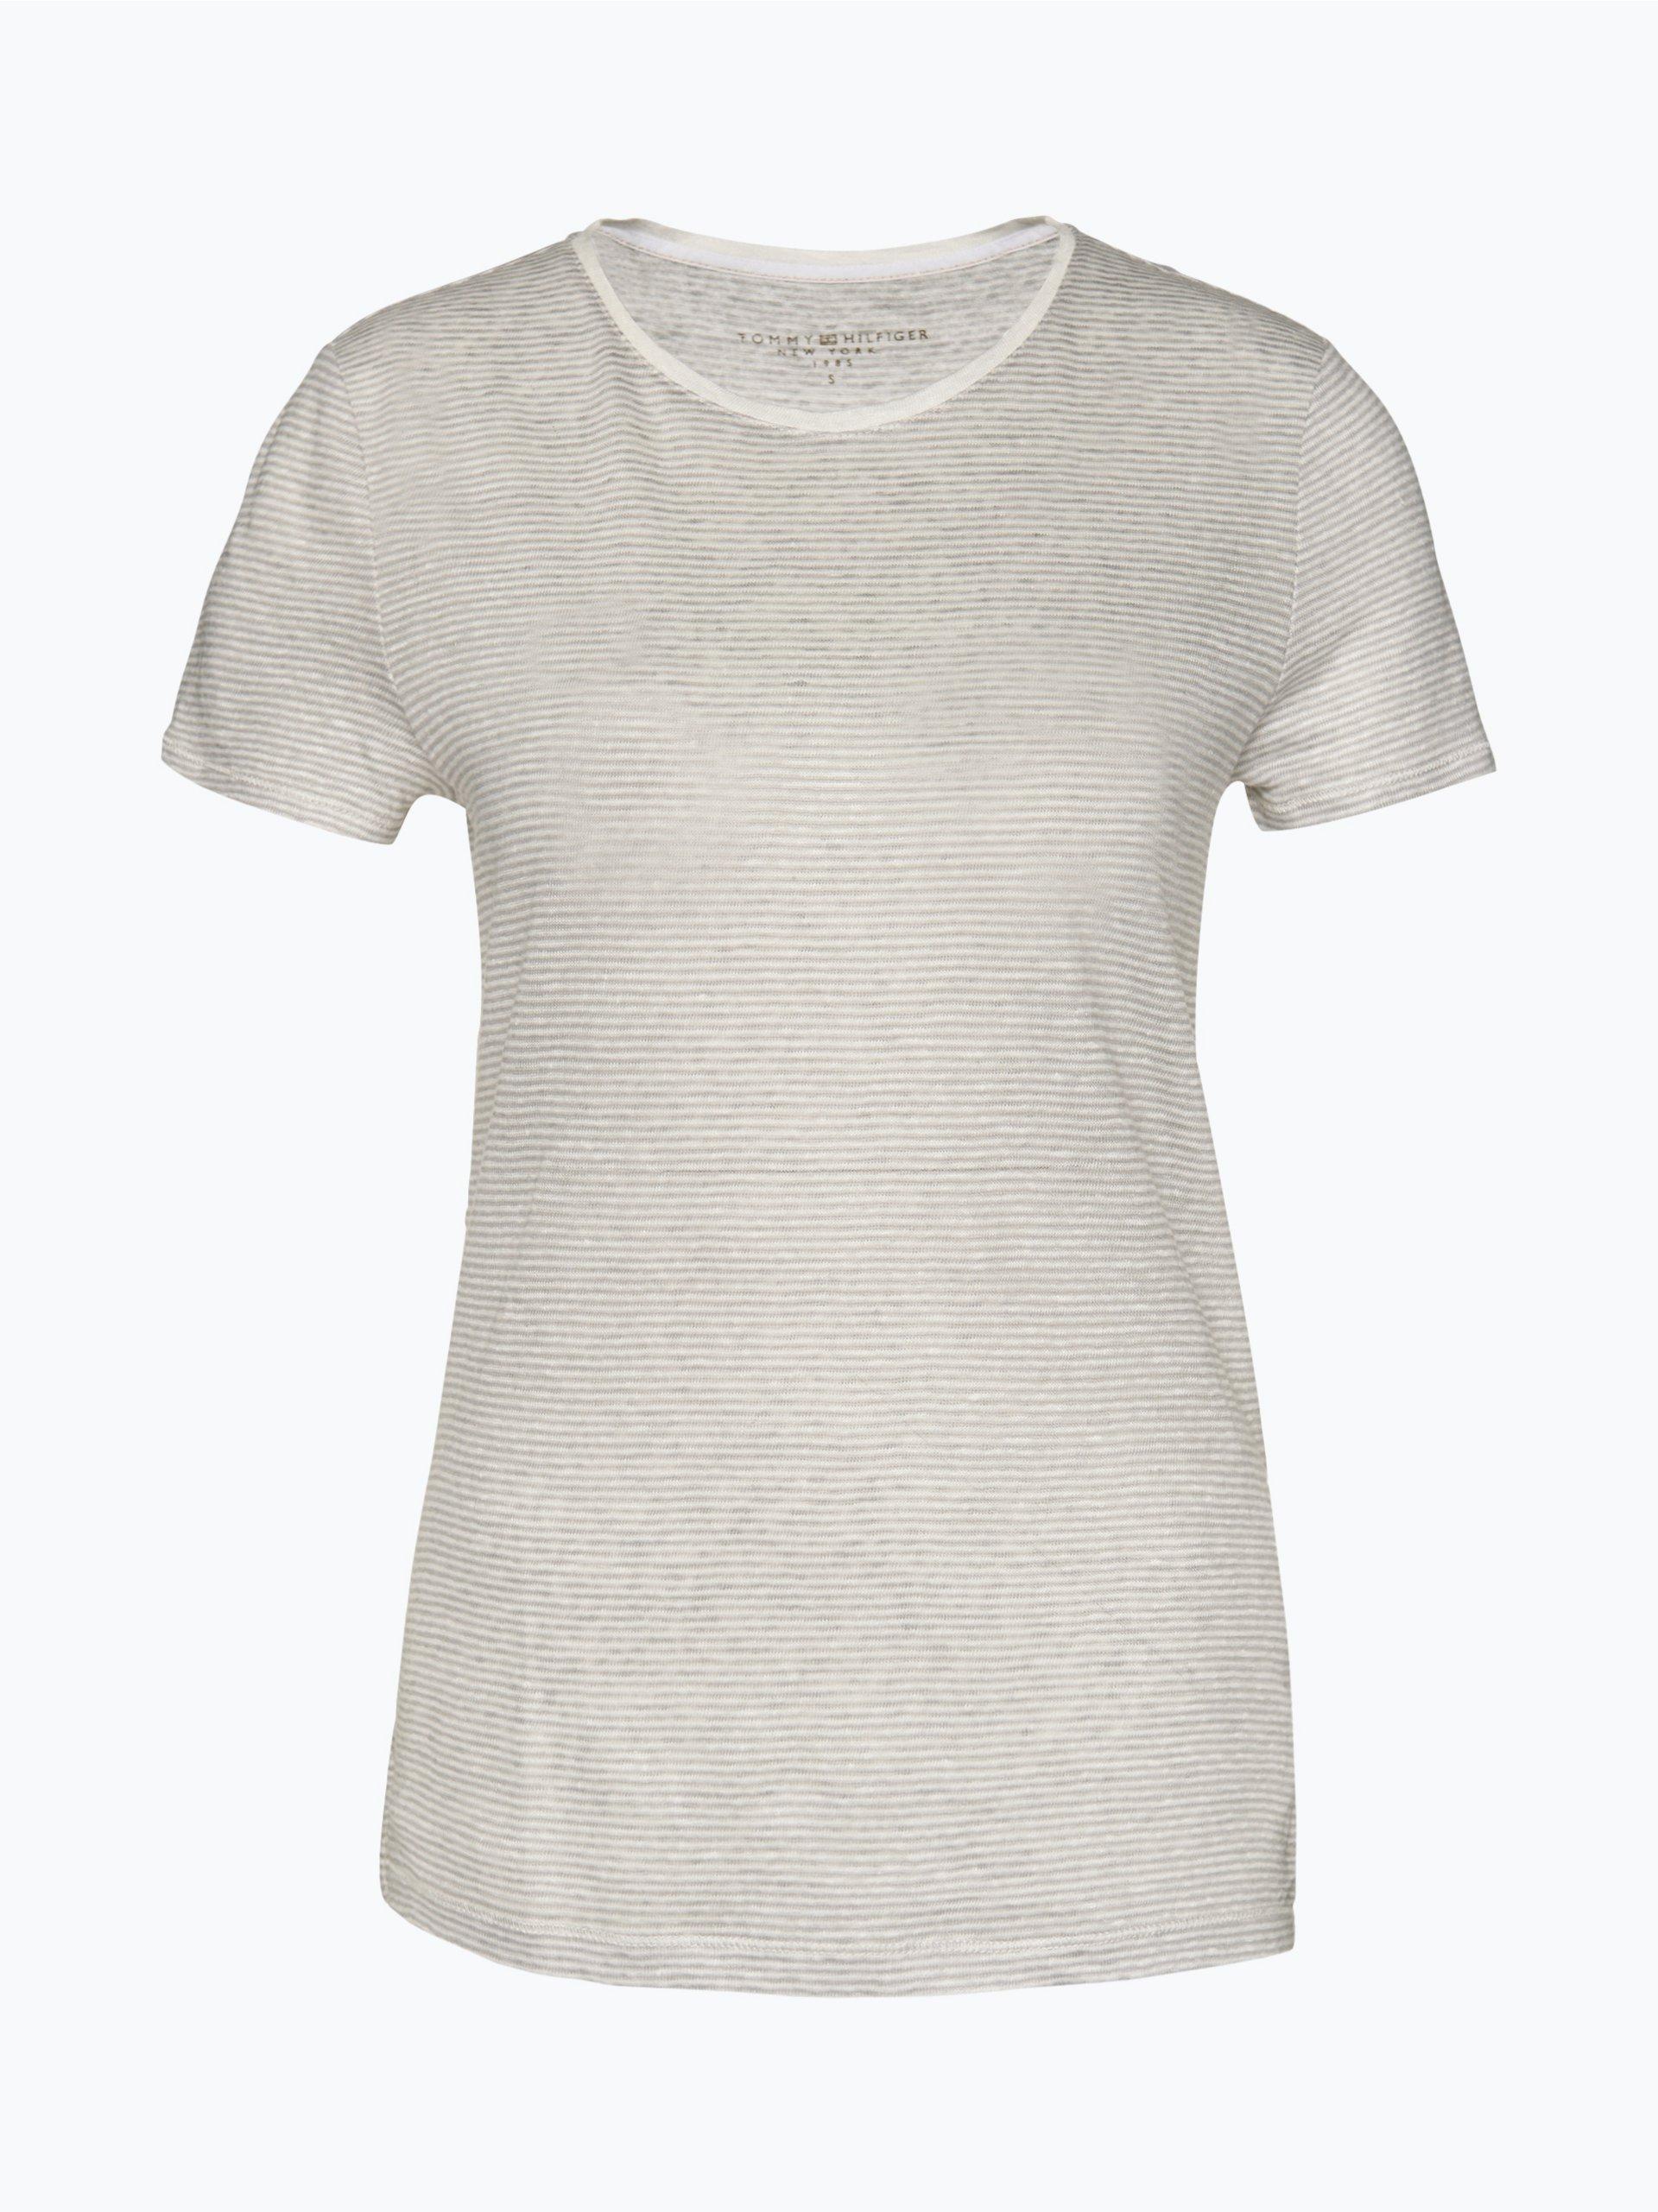 tommy hilfiger damen t shirt aus leinen clarissa silber. Black Bedroom Furniture Sets. Home Design Ideas